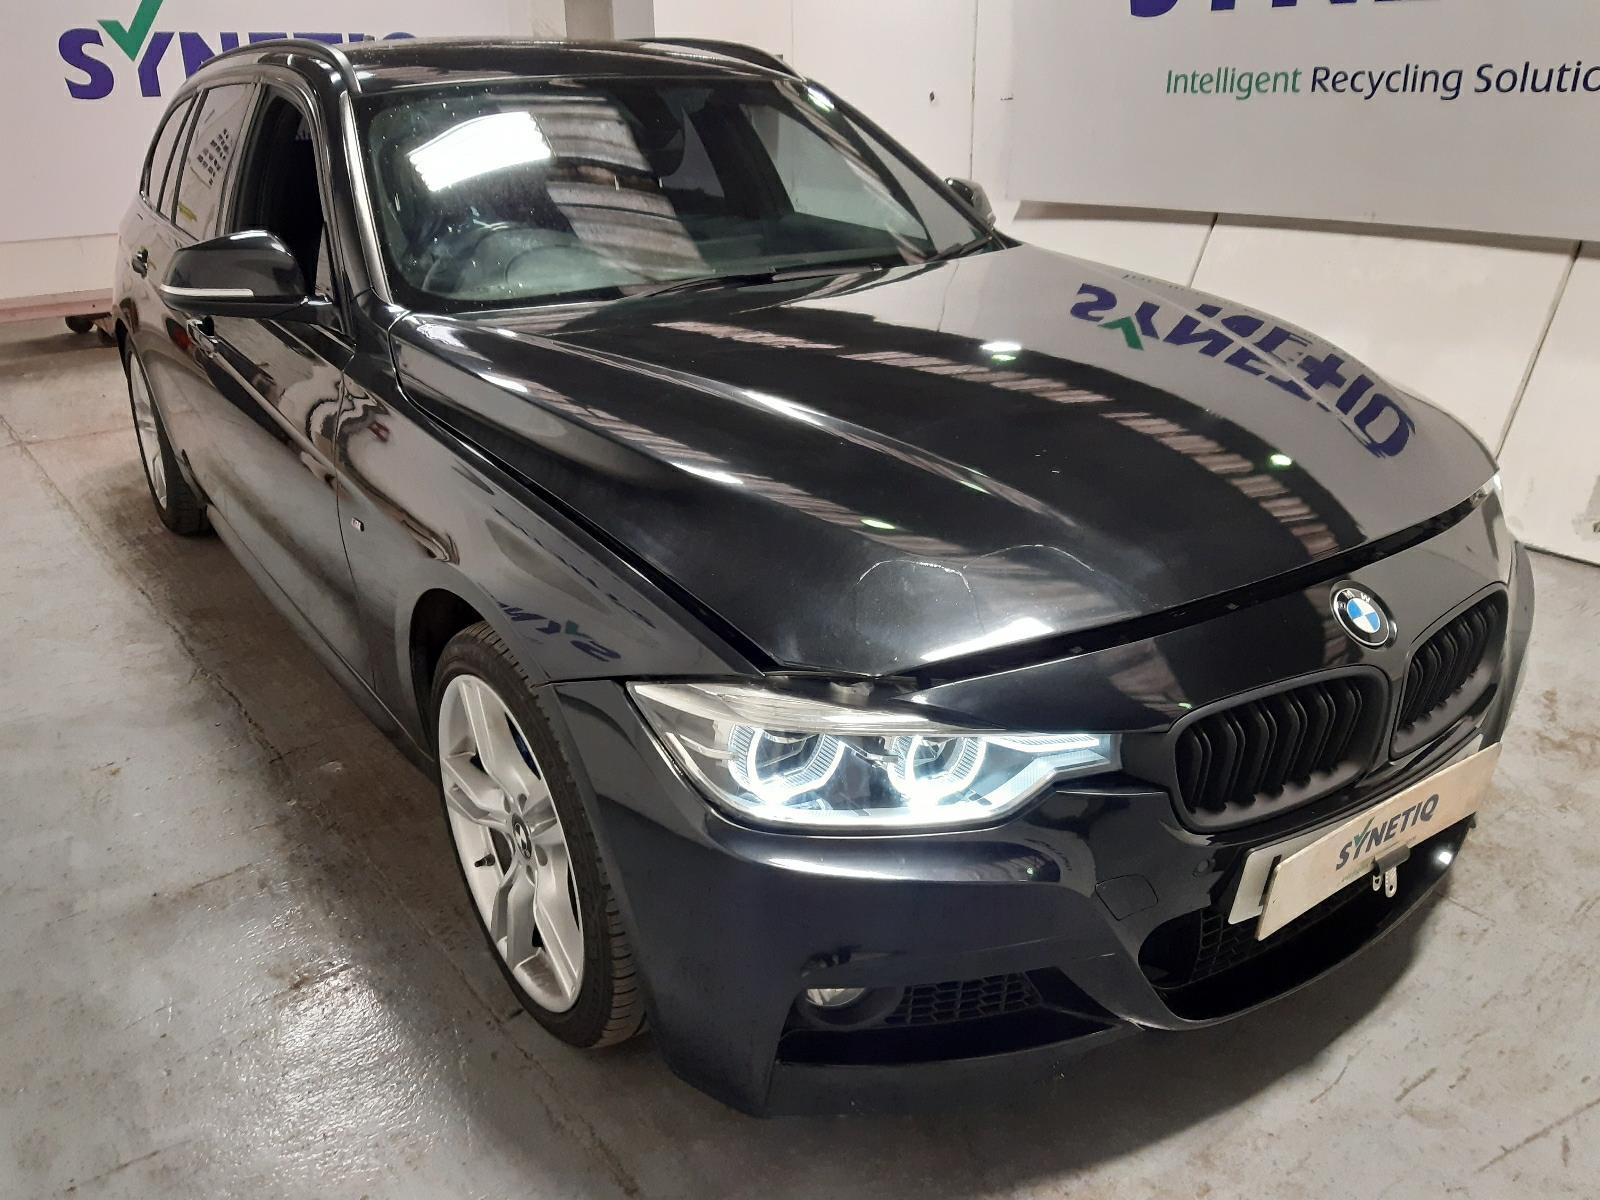 2016 BMW 3 SERIES 330D M SPORT TOURING 2993cc TURBO DIESEL AUTOMATIC 8 Speed 5 DOOR ESTATE